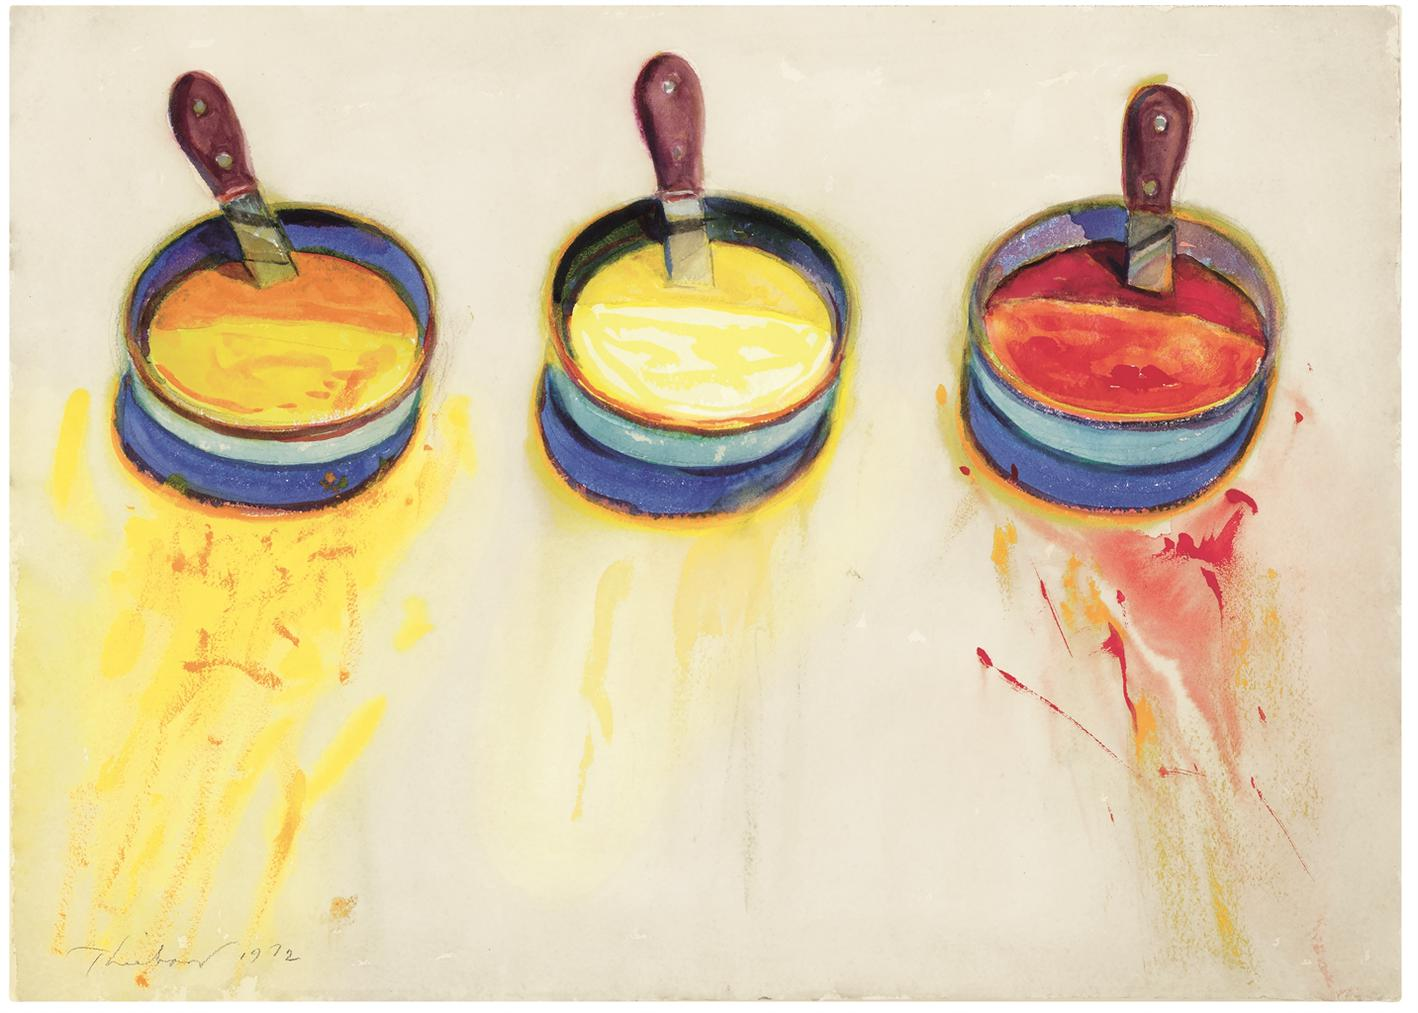 Wayne Thiebaud-Condiments-1972